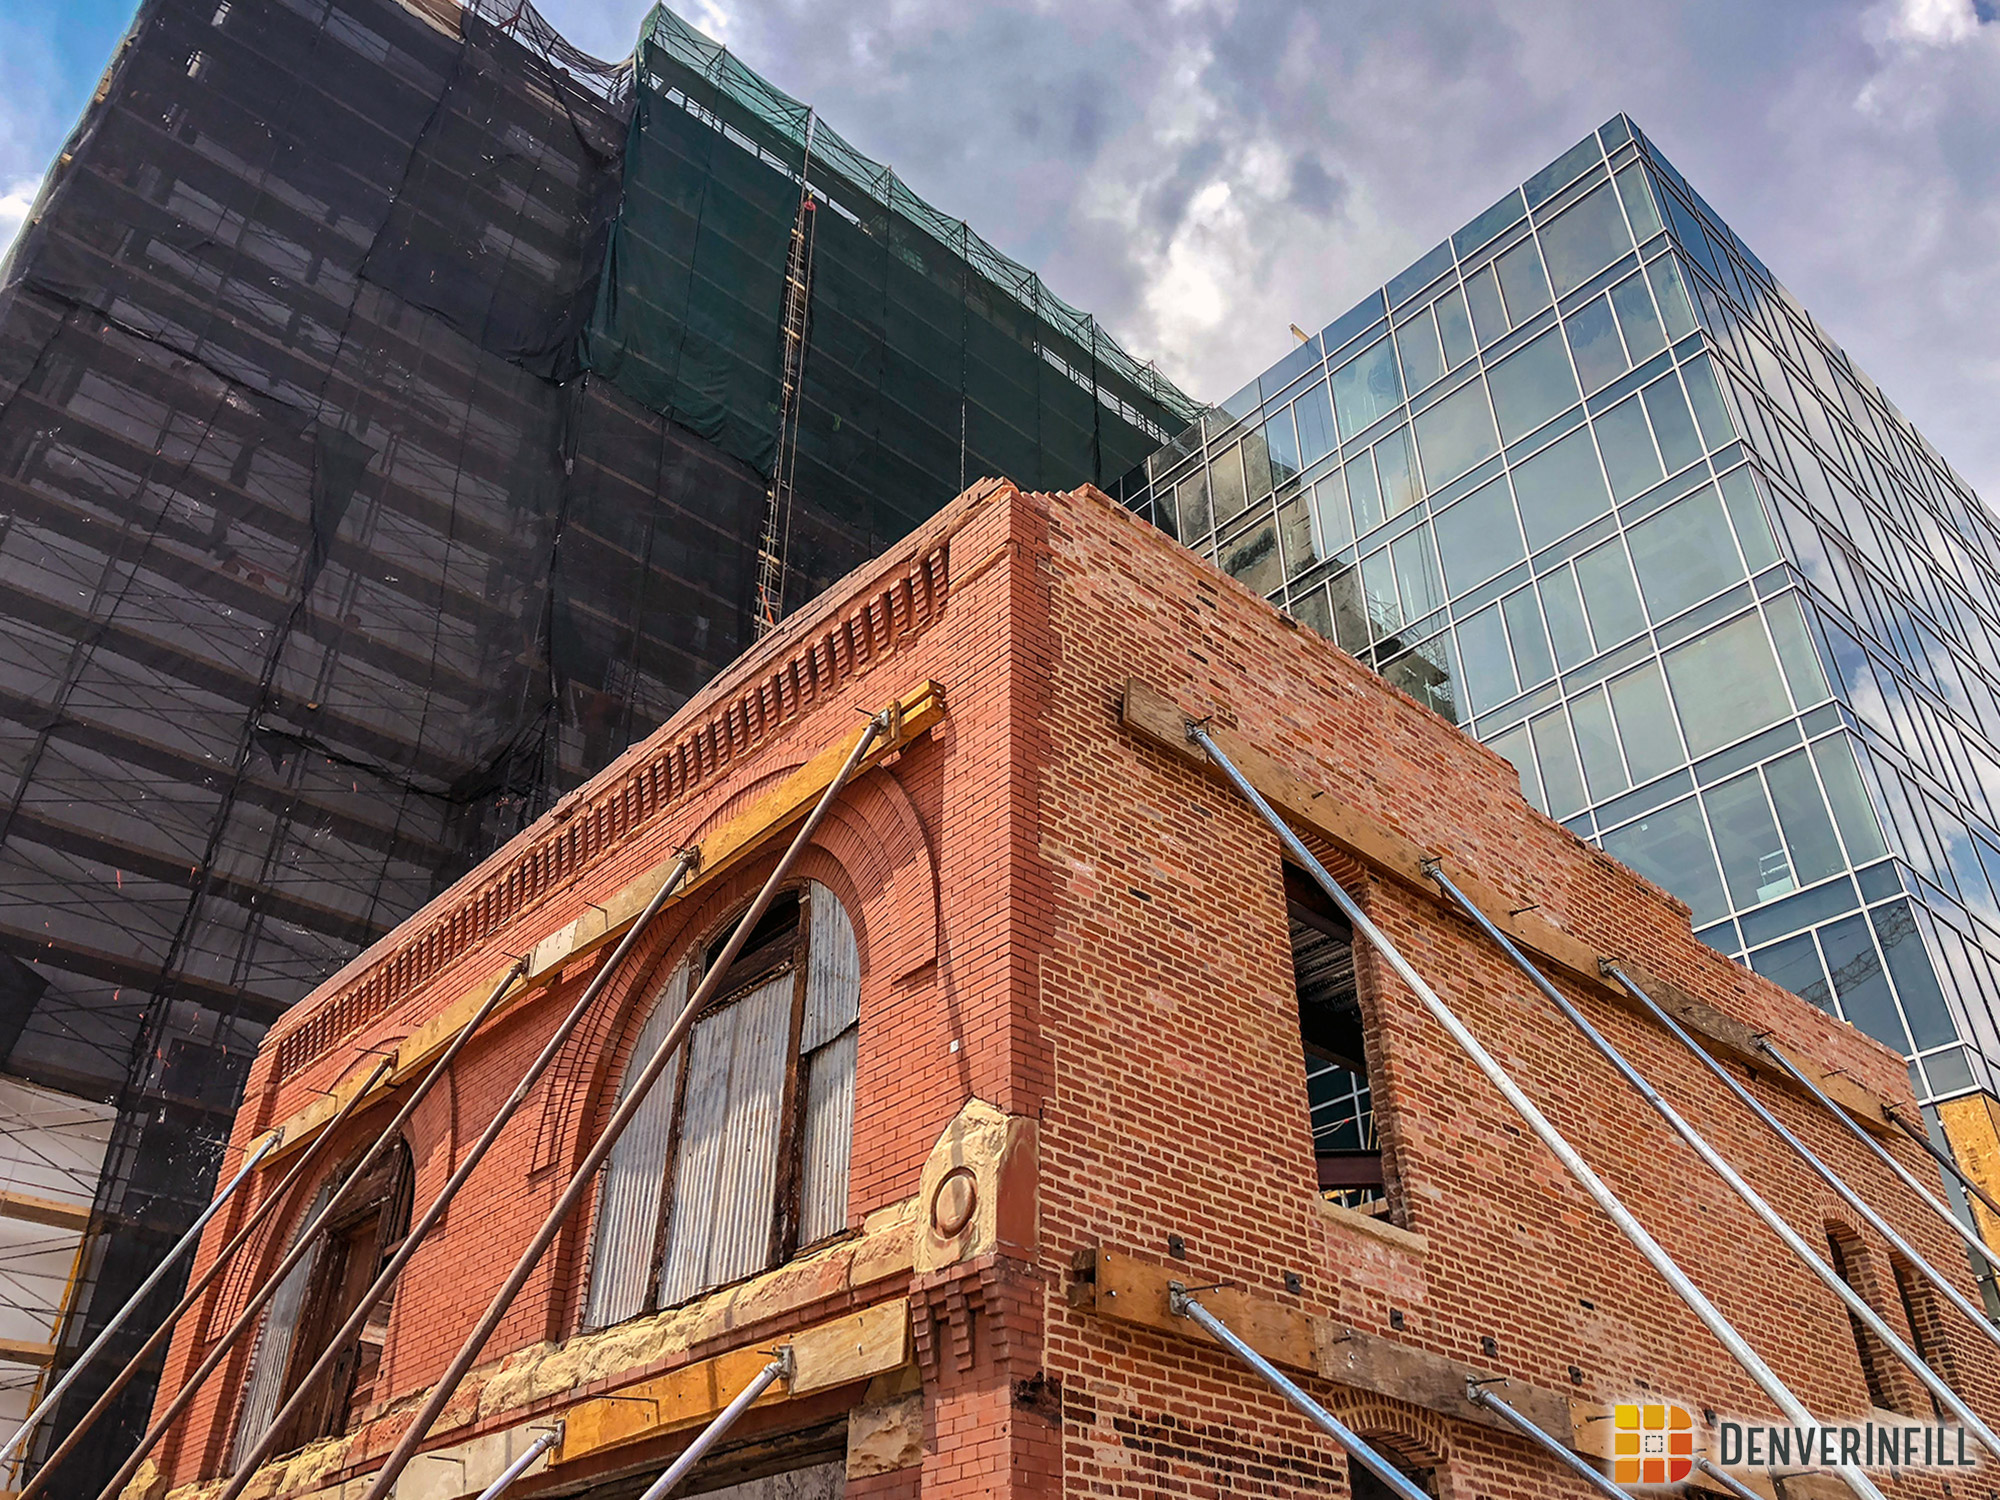 Historic Denver Hose Company No. 1 building as part of the Hilton Garden Inn DUS development